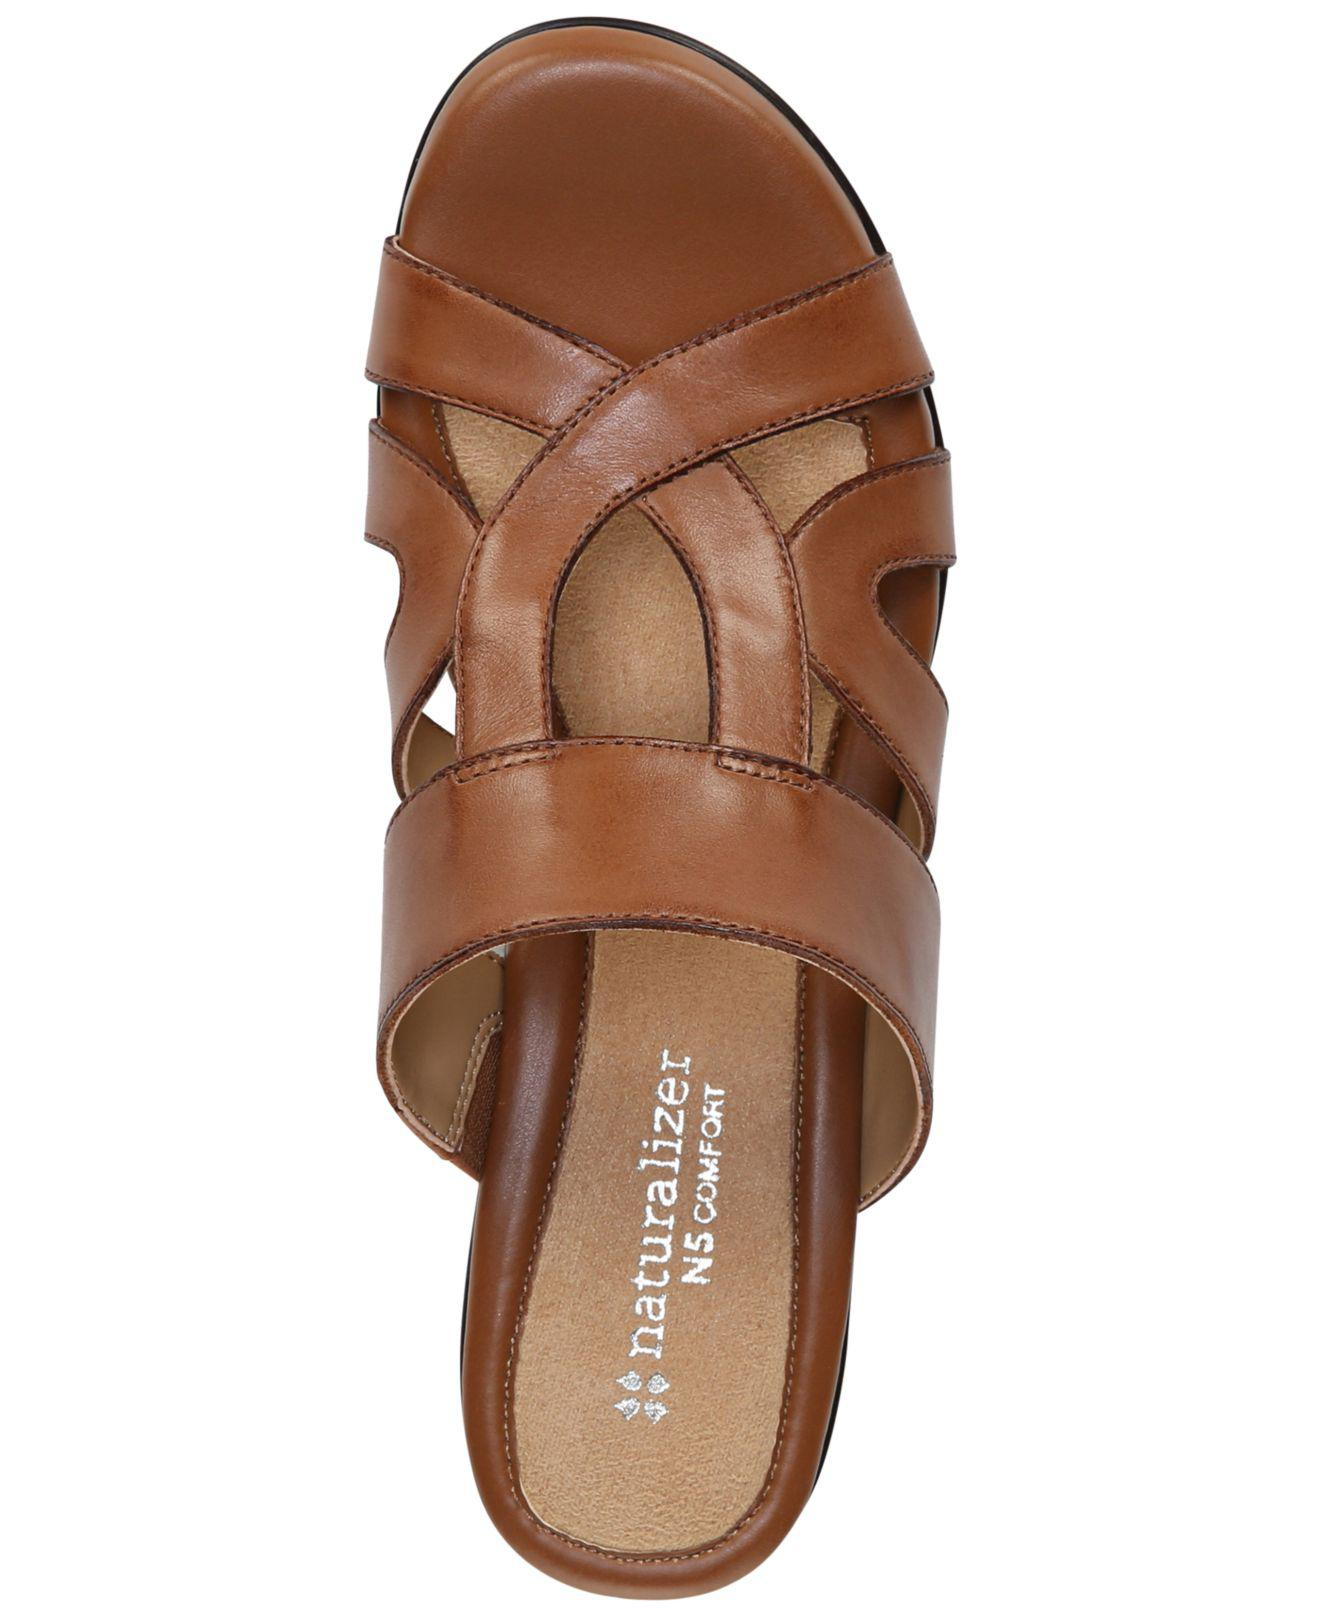 63199cbfaf8e Naturalizer - Brown Vanity Sandals - Lyst. View fullscreen